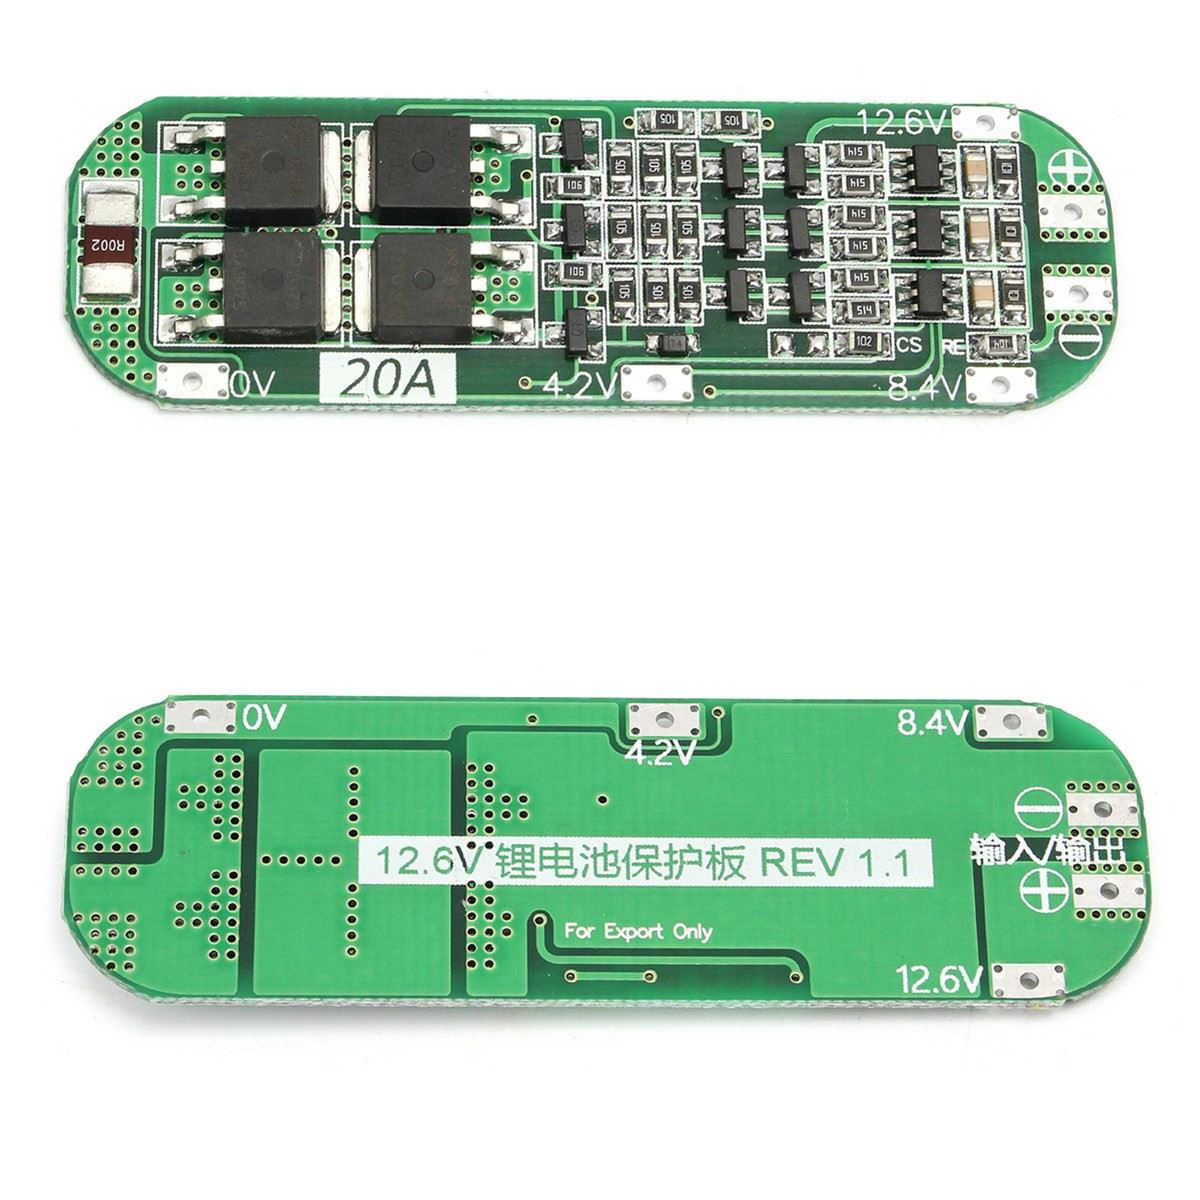 3S 20A Li-Ion LITHIUM แบตเตอรี่ 18650 เครื่องชาร์จ PCB BMS Protection BOARD CELL 12.6V